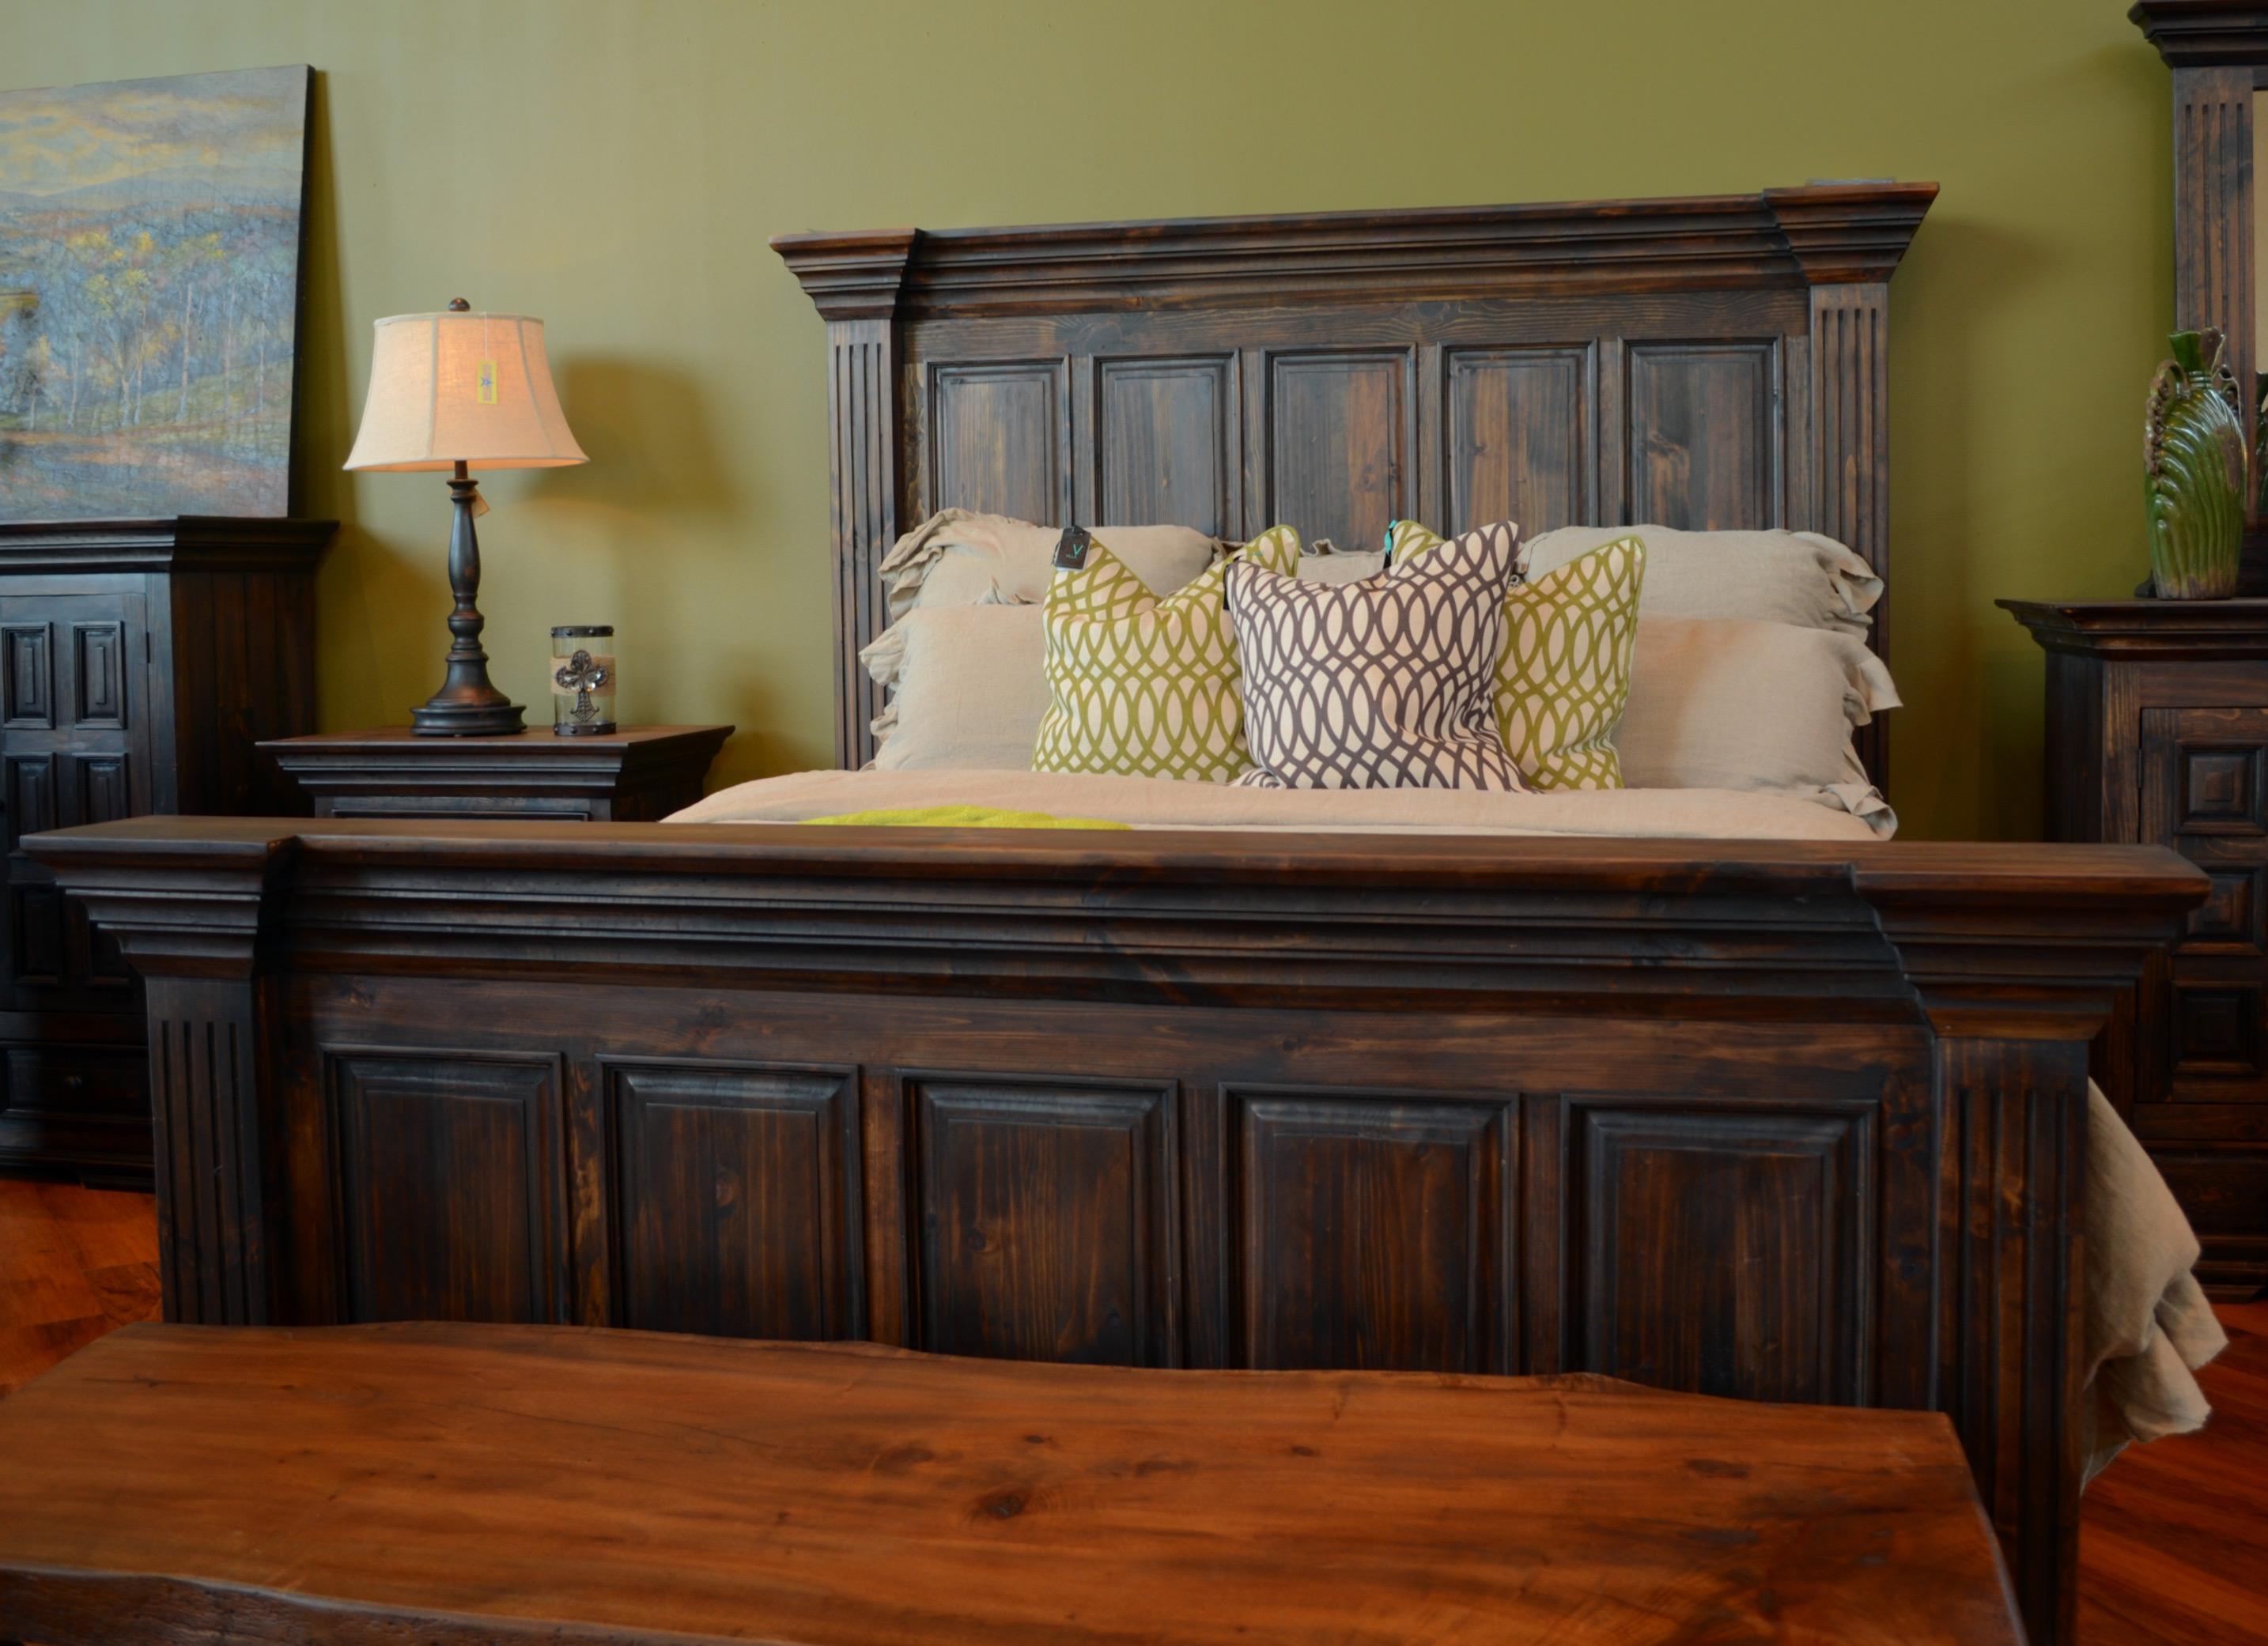 vintage wyoming queen panel bed item number grp wyoming queenbed - King Panel Bed